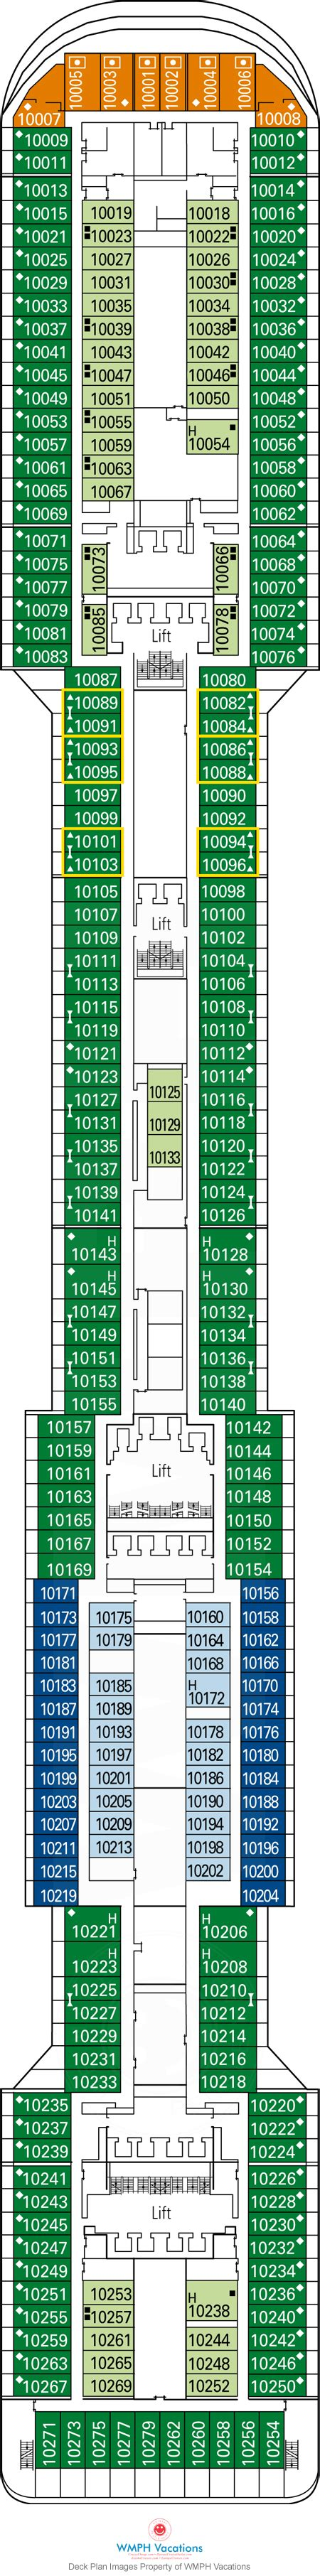 Msc Divina Deck Plan 12 by Msc Divina Deck Plans Deck 10 What S On Deck 10 On Msc